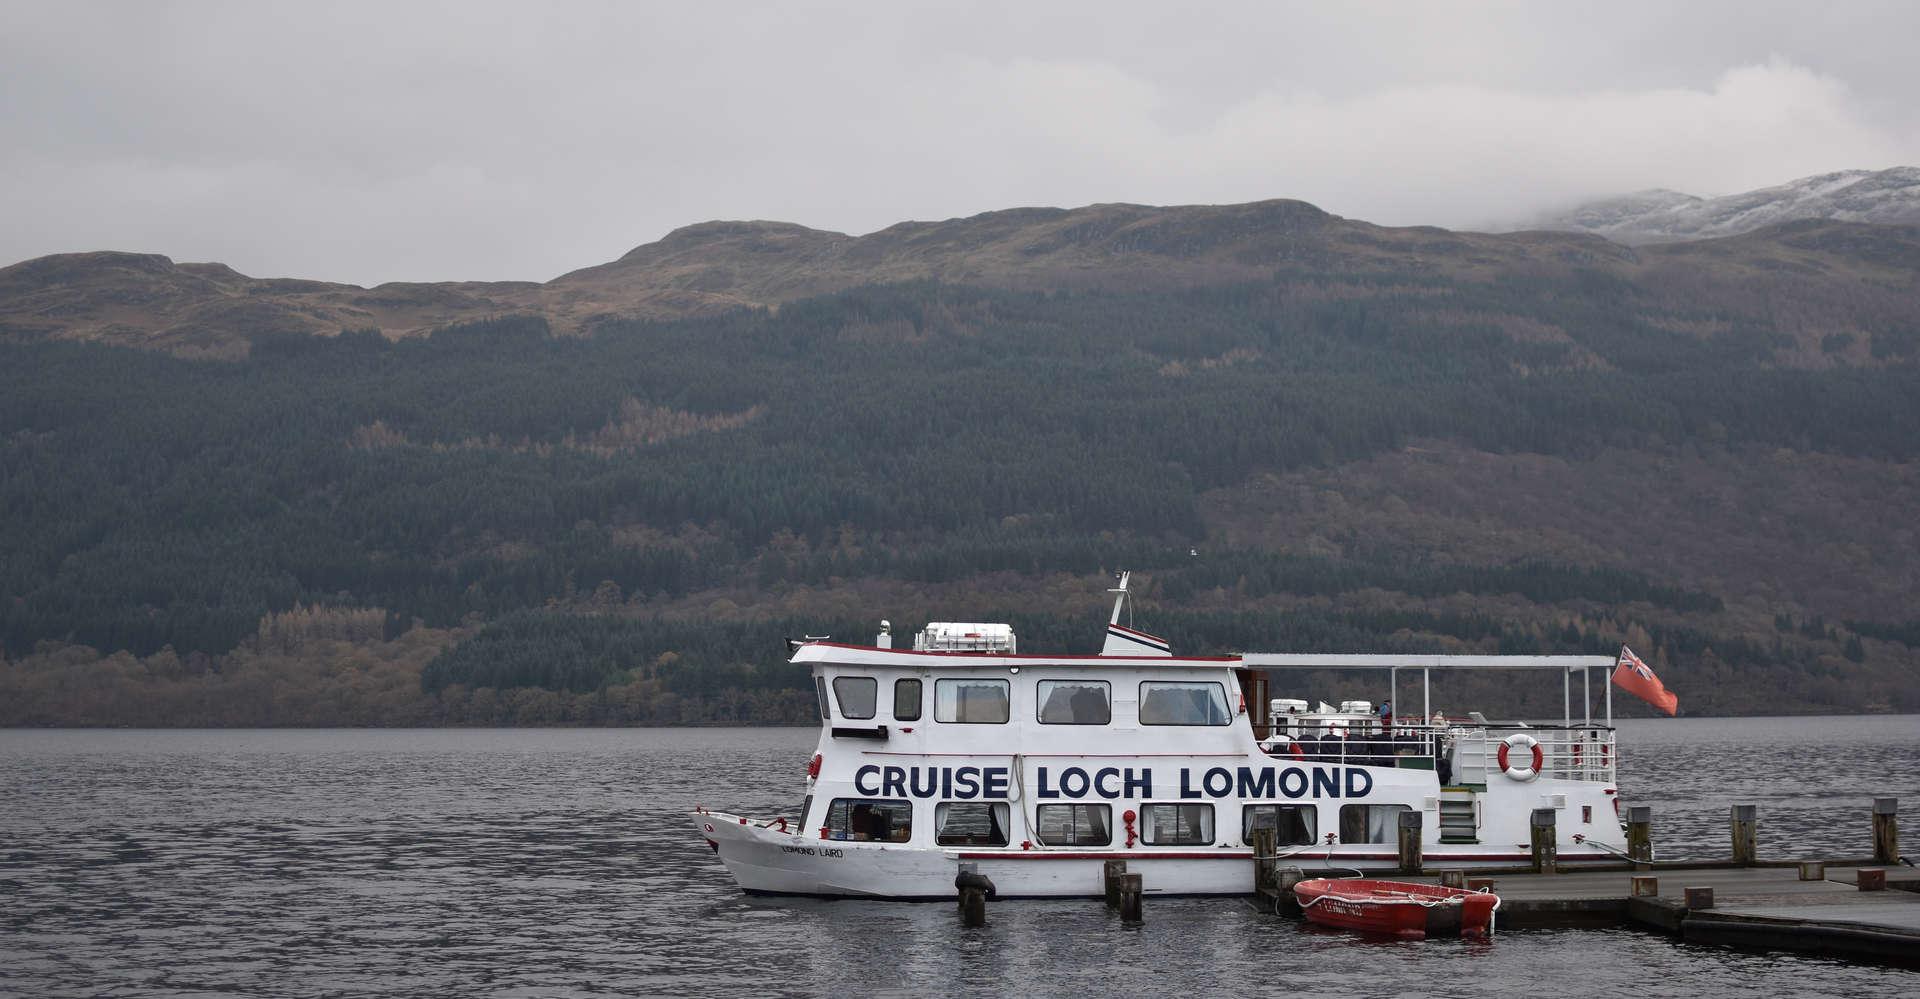 private cruise boat on loch lomond